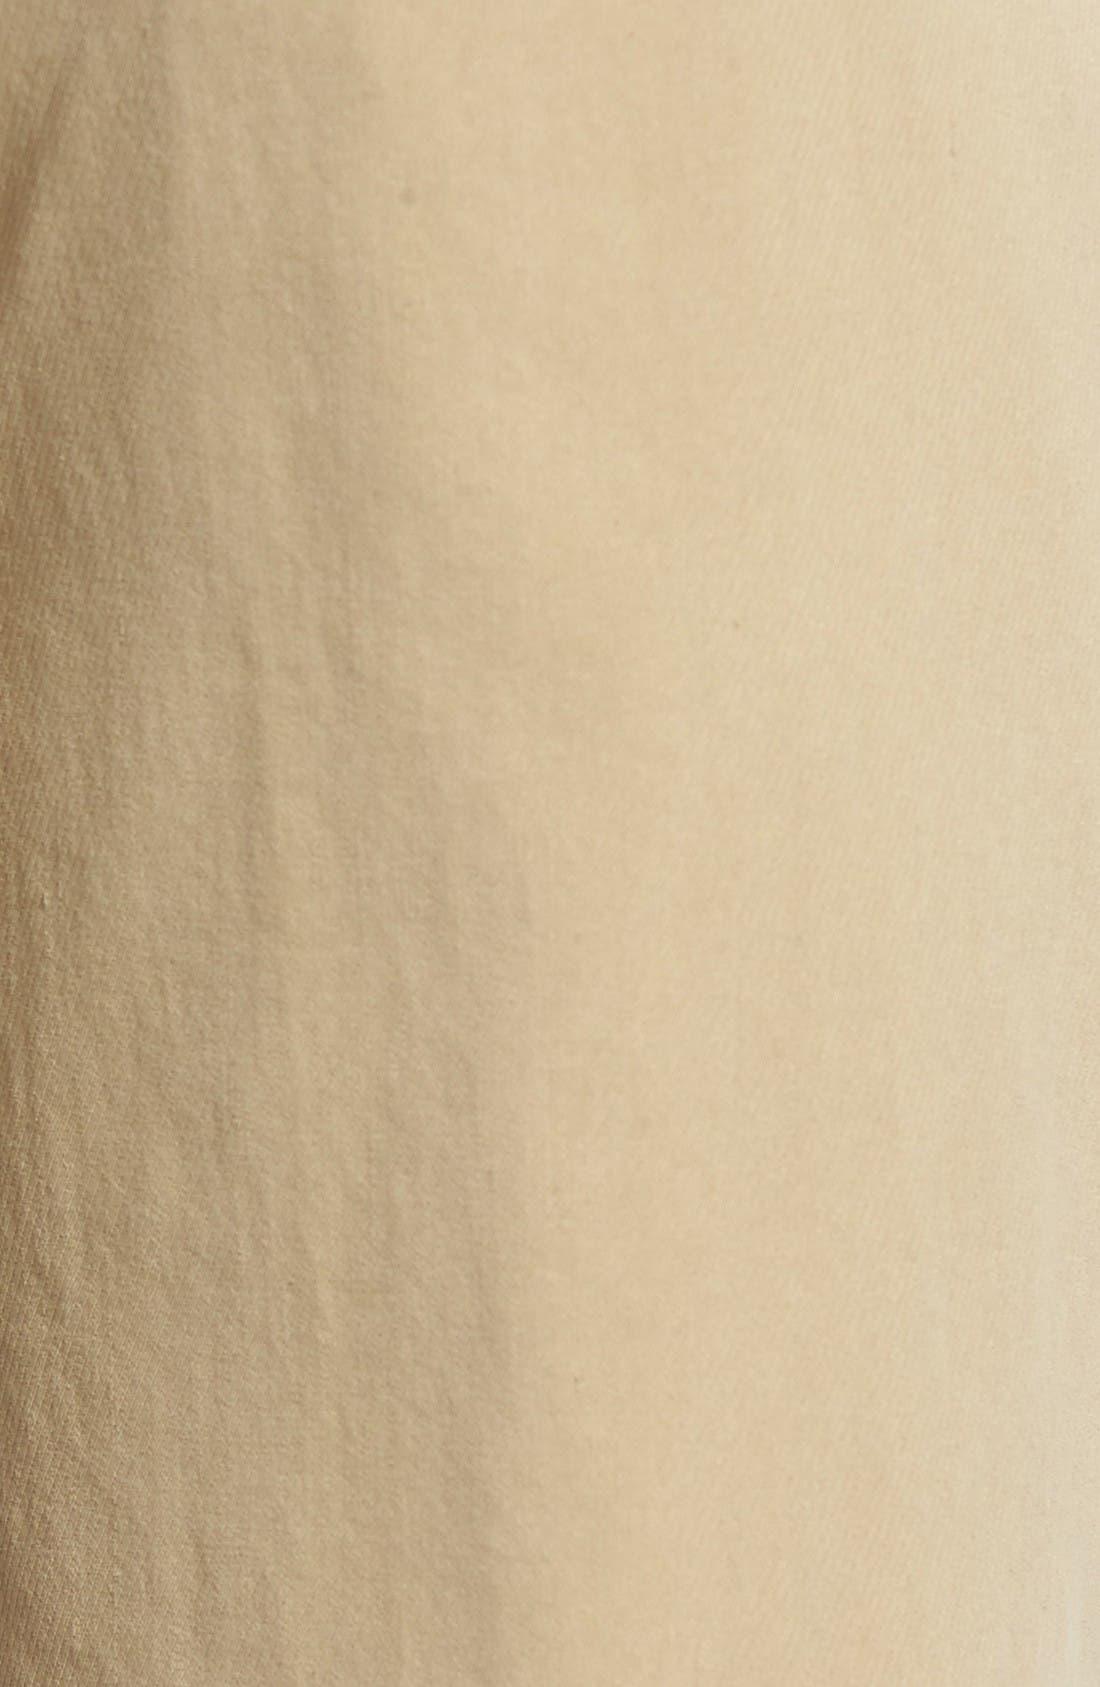 St. Thomas Pleated Shorts,                             Alternate thumbnail 5, color,                             Sisal